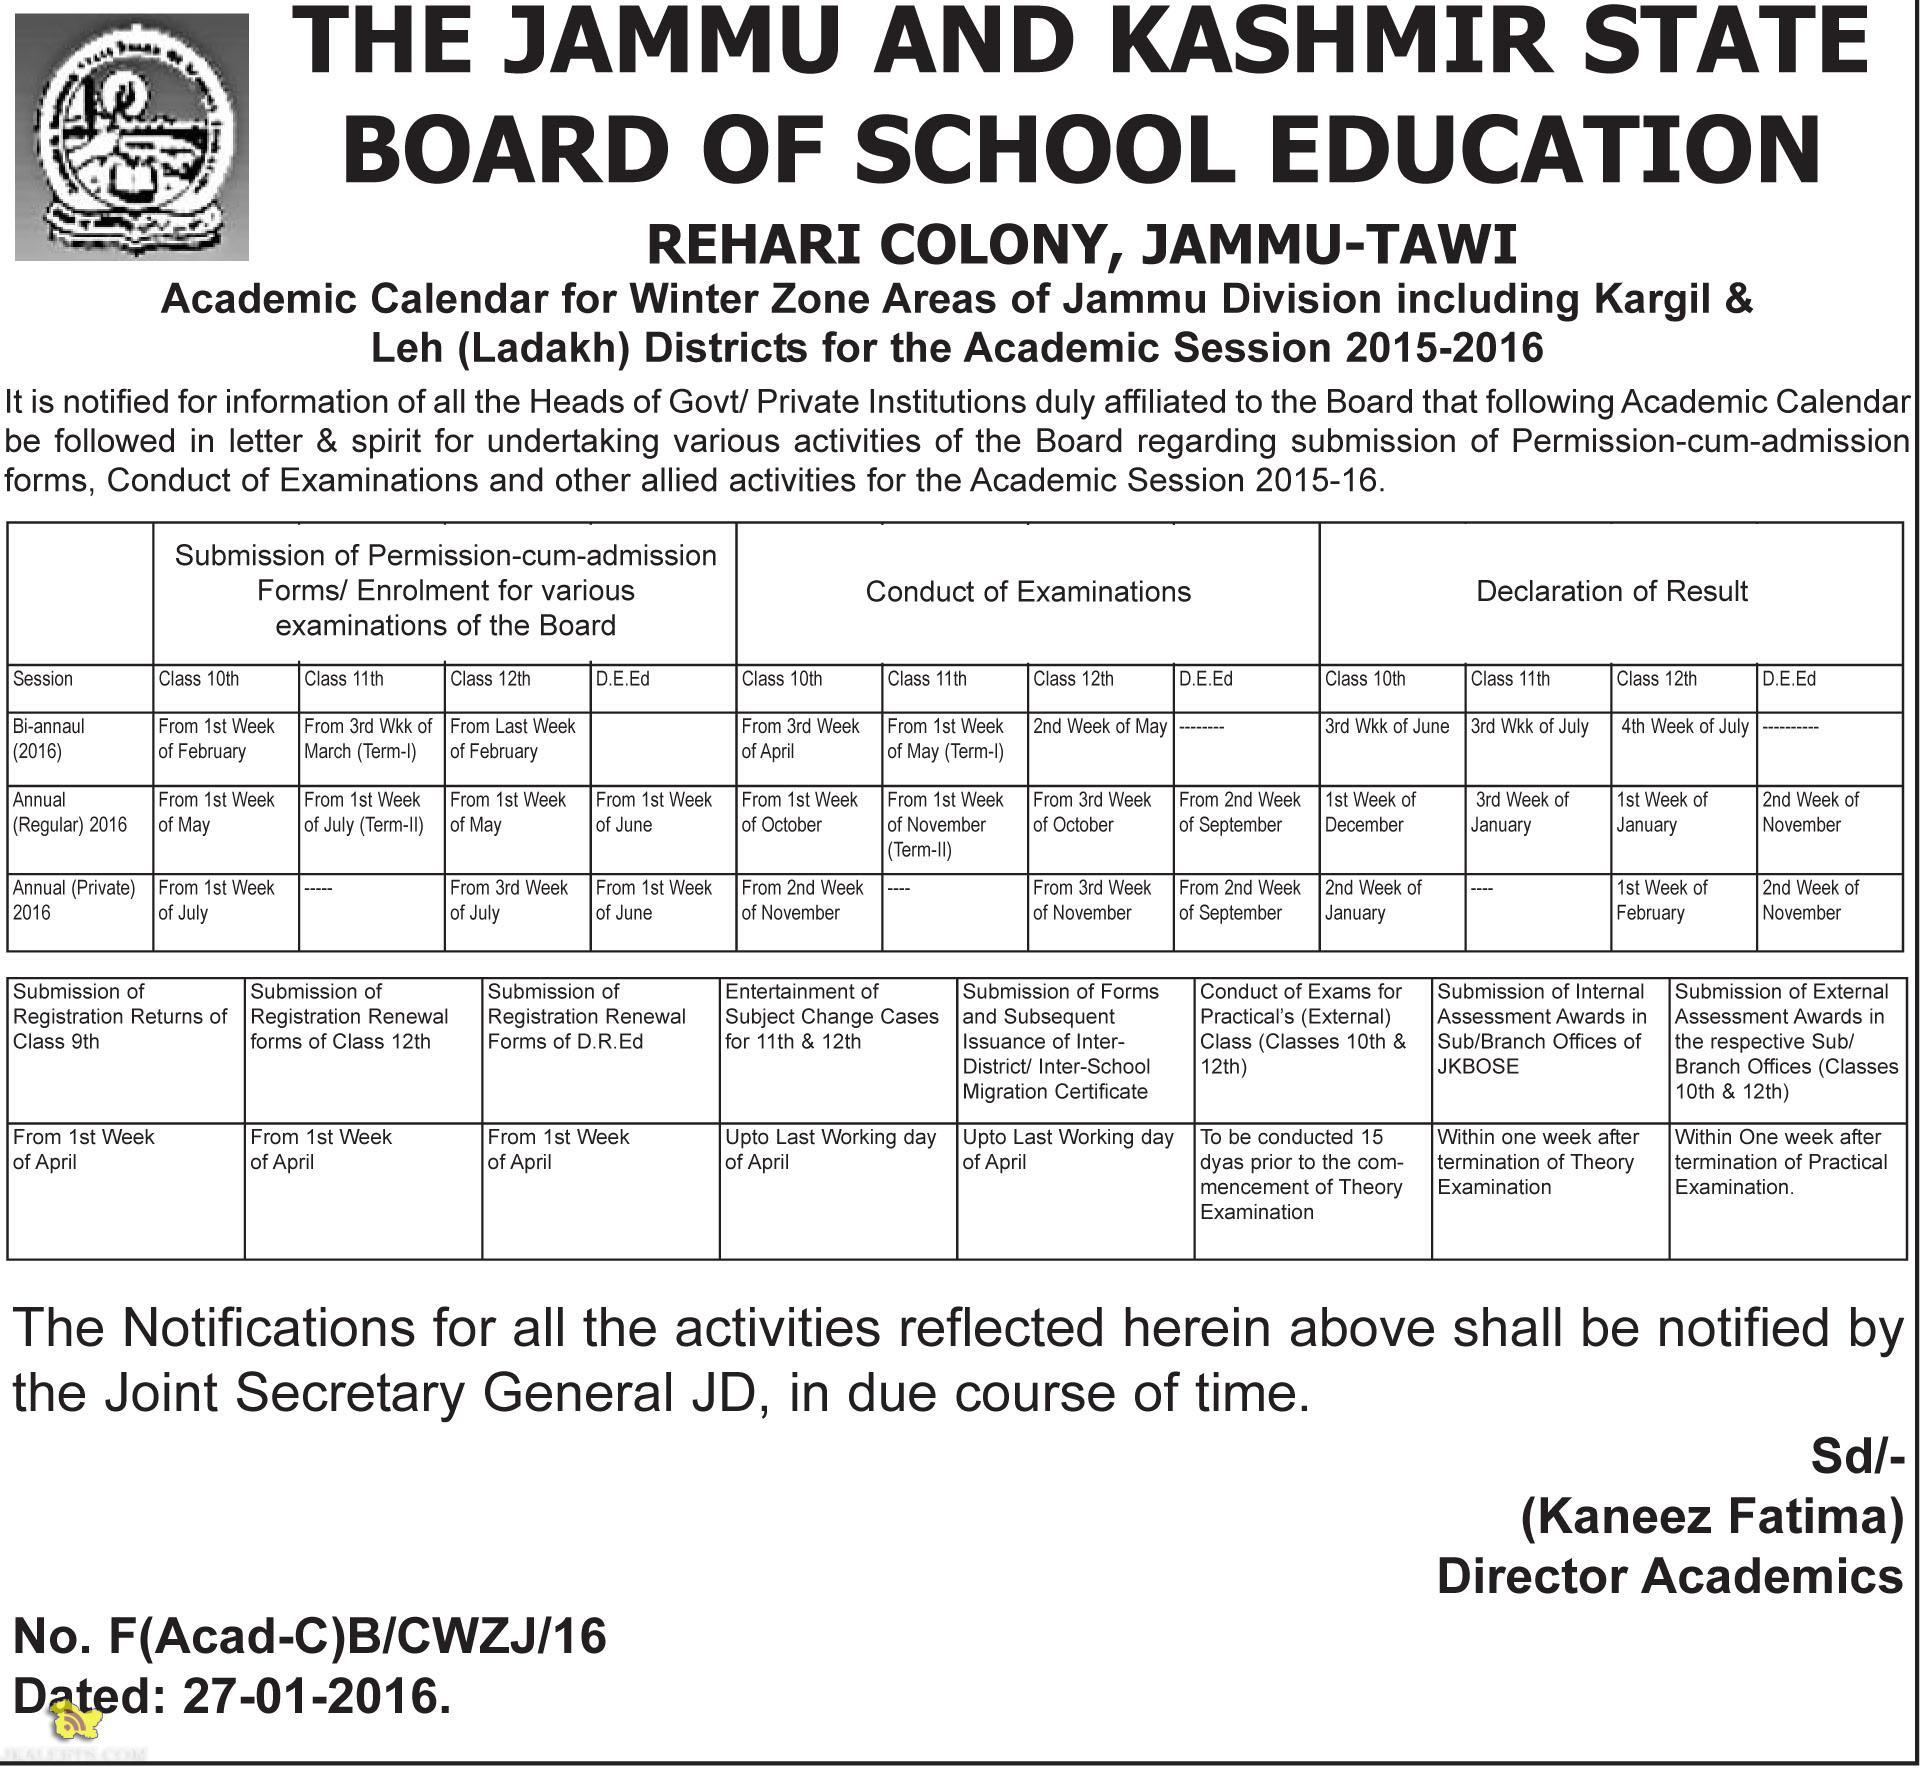 JKBOSE Academic Calendar for Jammu Division Kargil & Leh (Ladakh) for the Academic Session 2015-2016